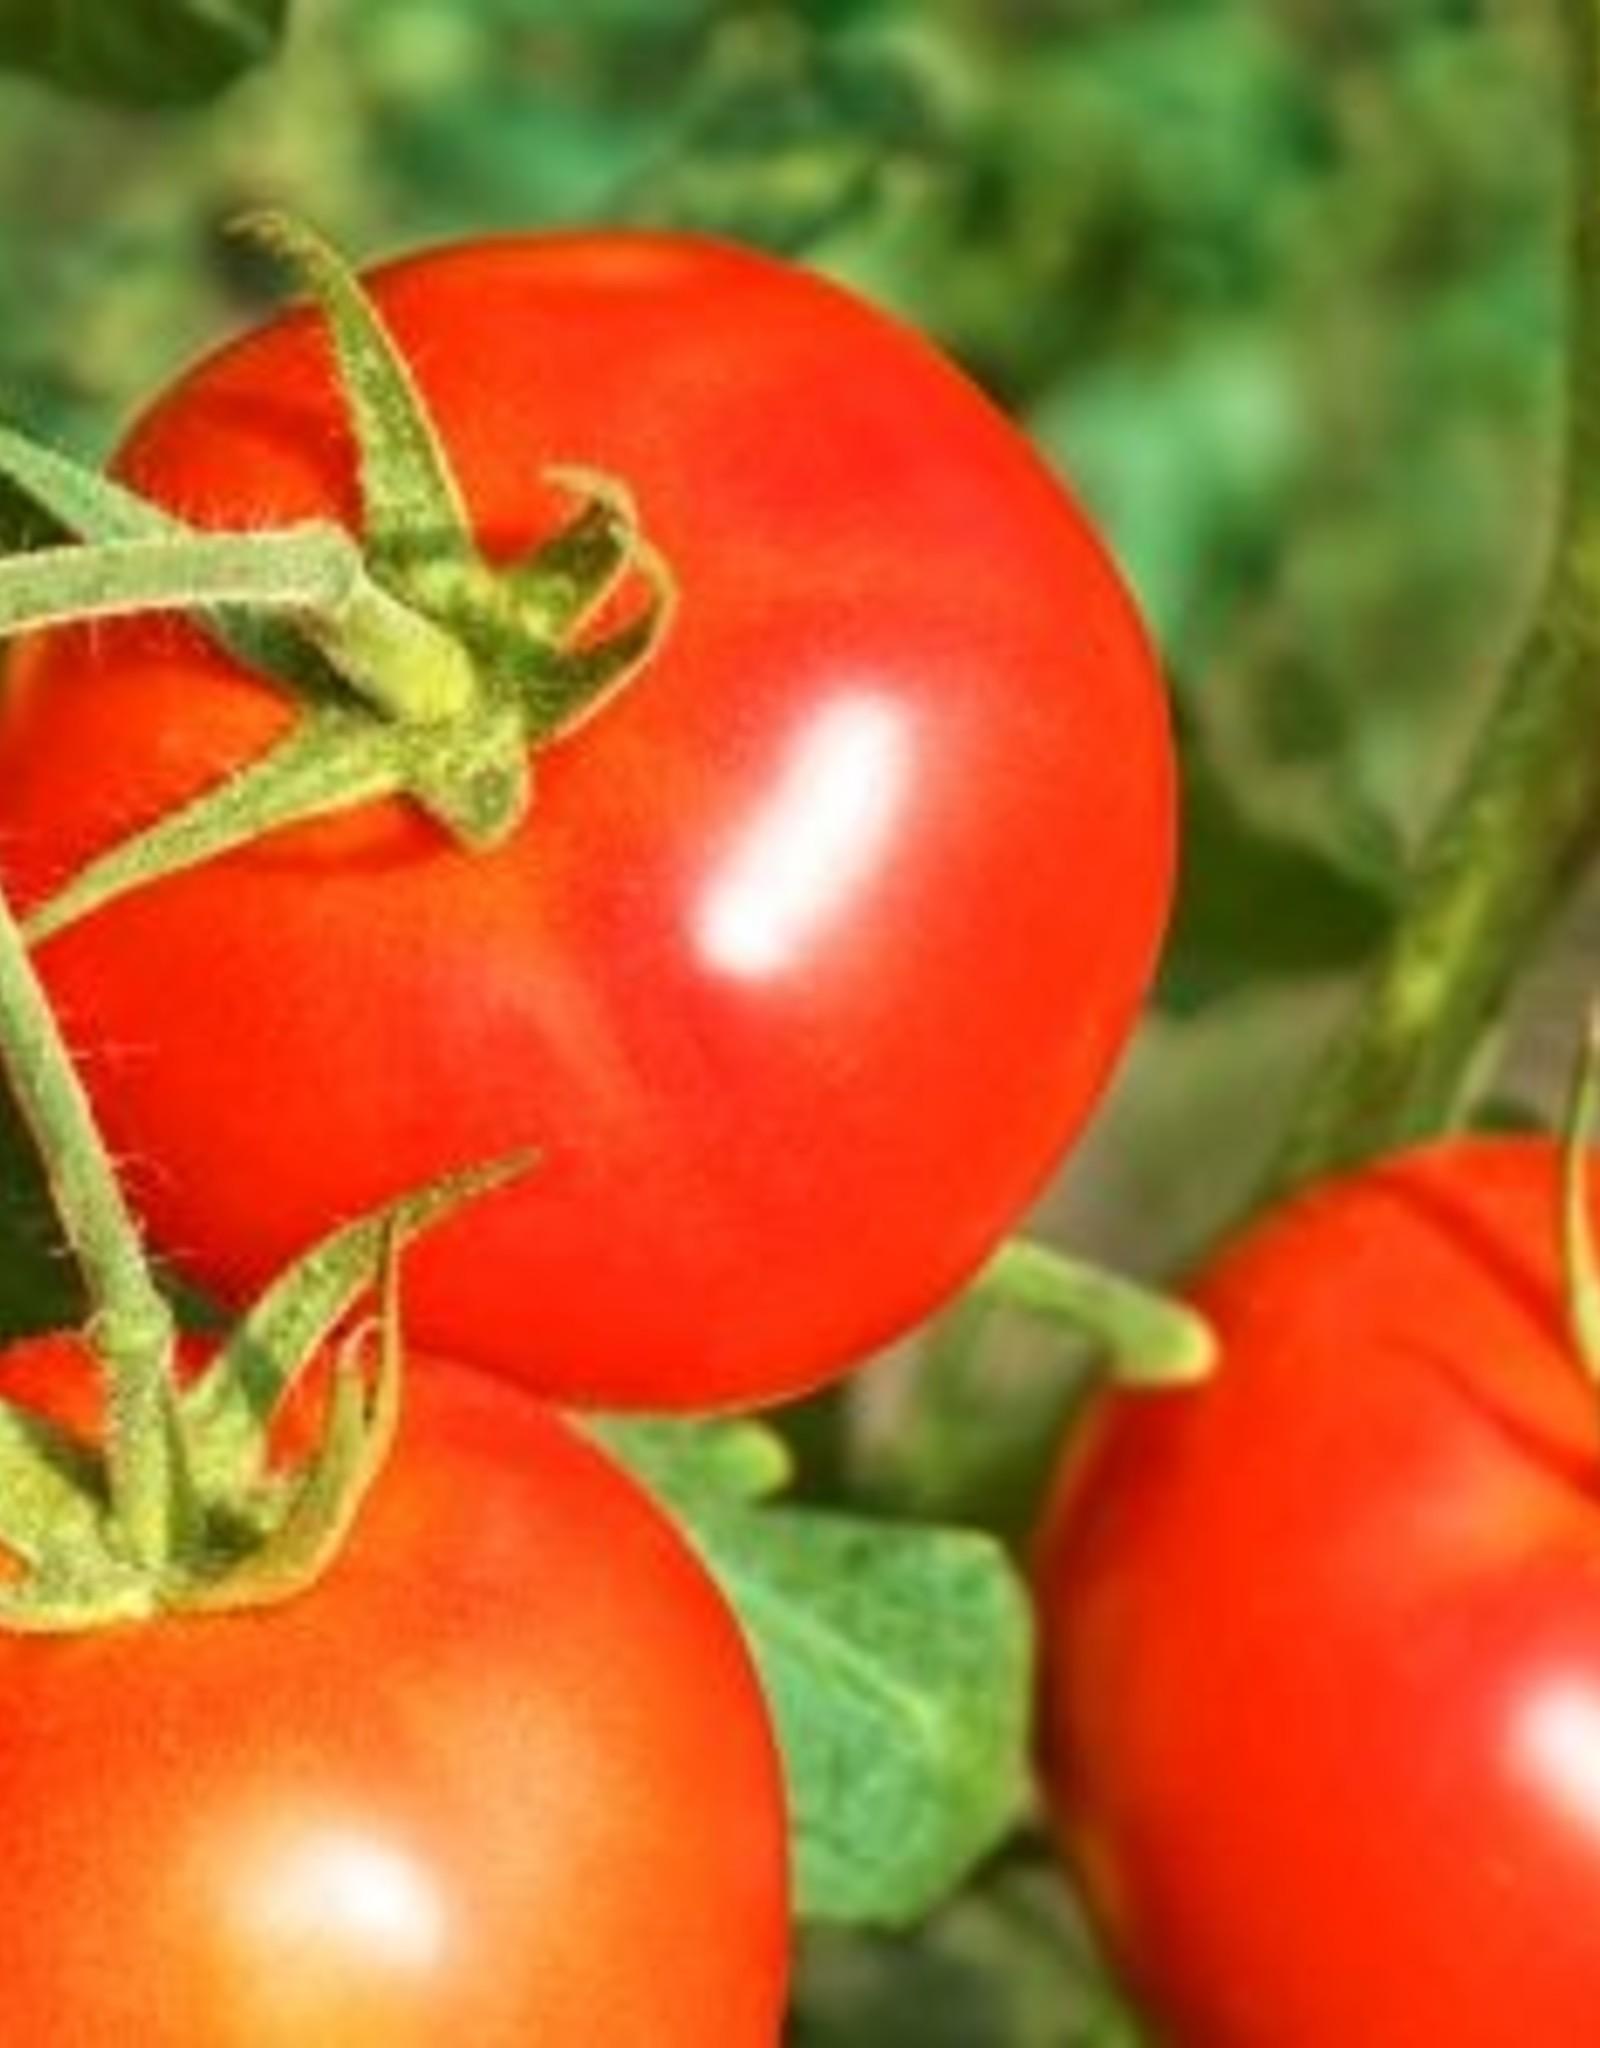 Tasty tom tomatensoep (vegetarisch) met bosui en honingtomaatjes